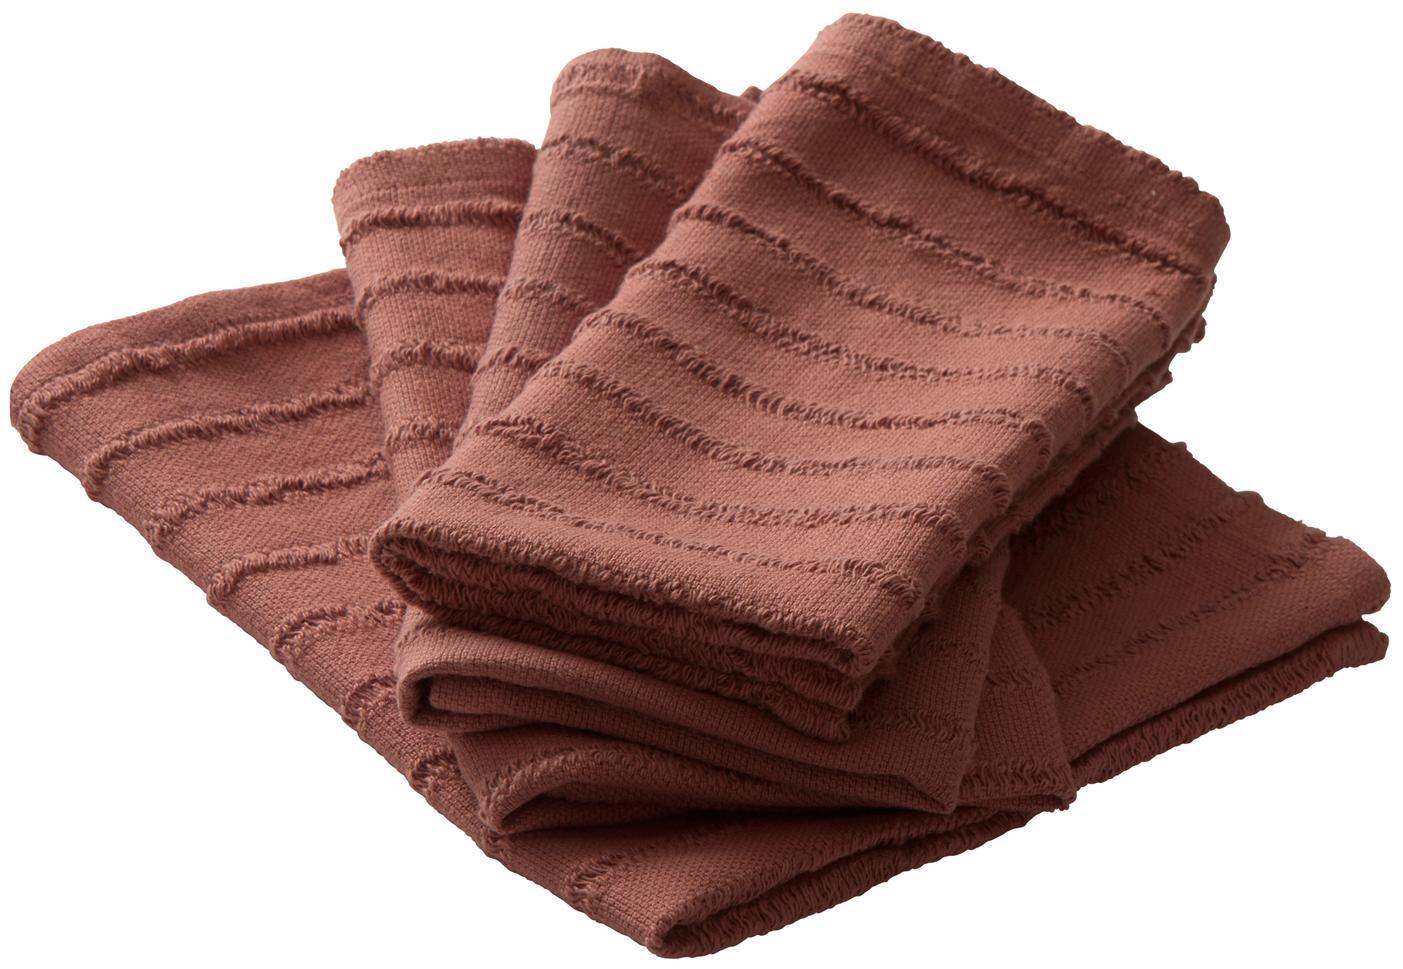 Servilletas de algodón Loveli, 4uds., Algodón, Rojo terracota, An 42 x L 42 cm